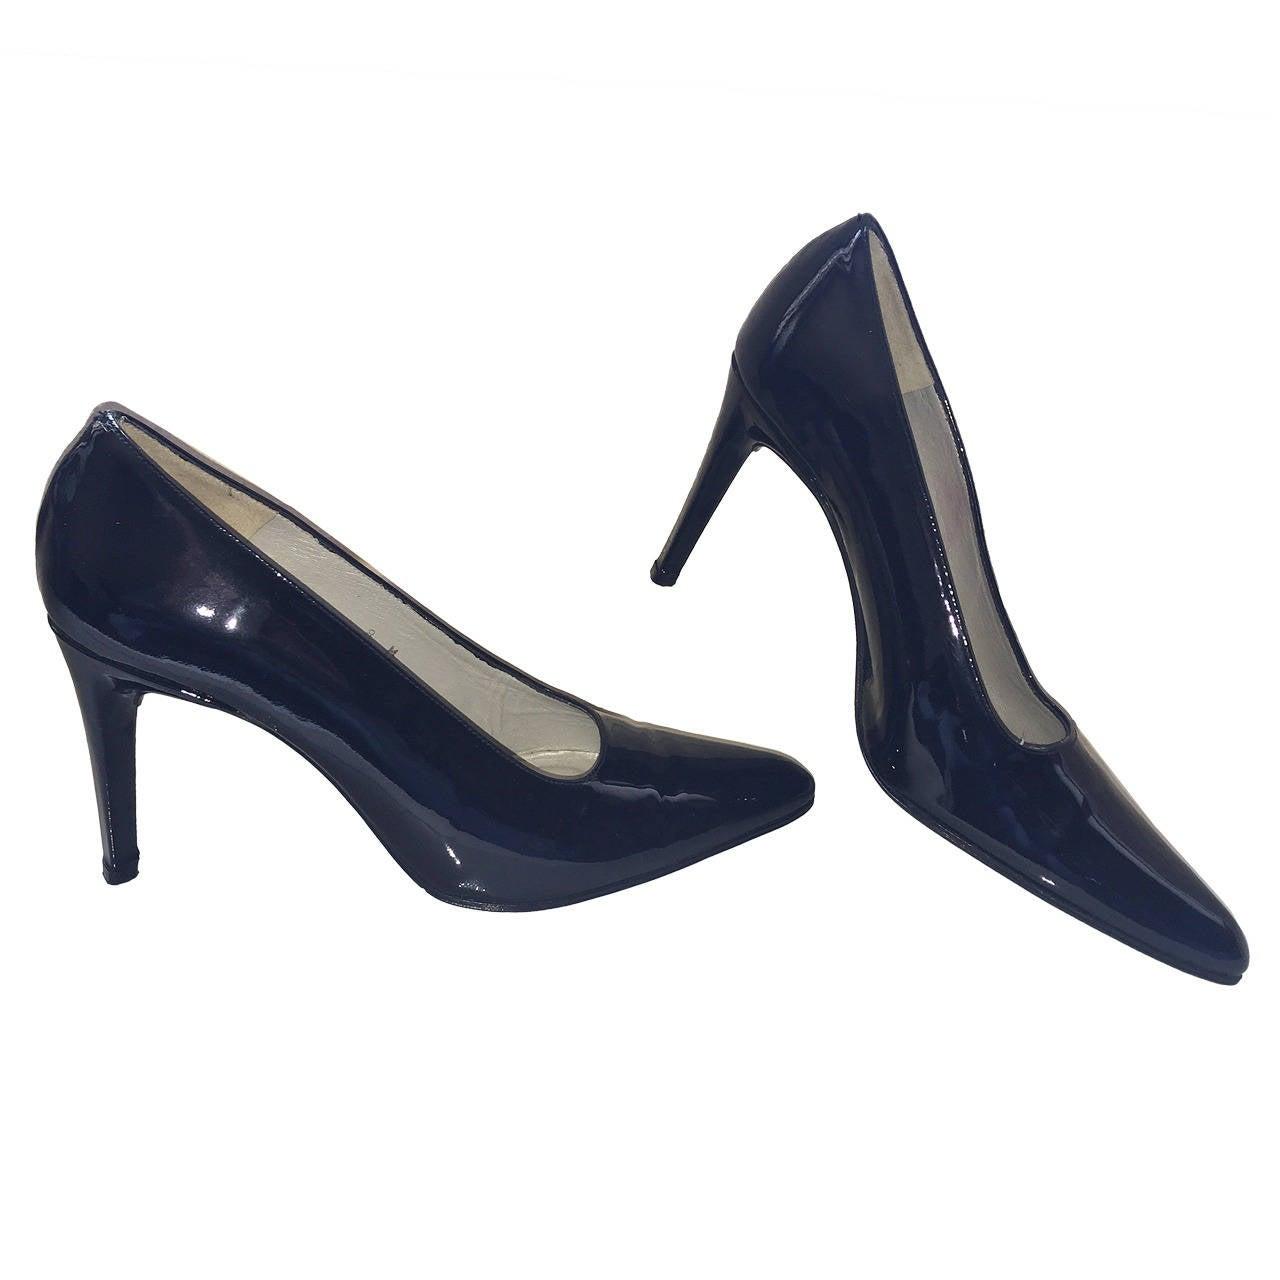 Vintage Carlos Falchi Classic Black Patent Leather Pumps / Heels ...